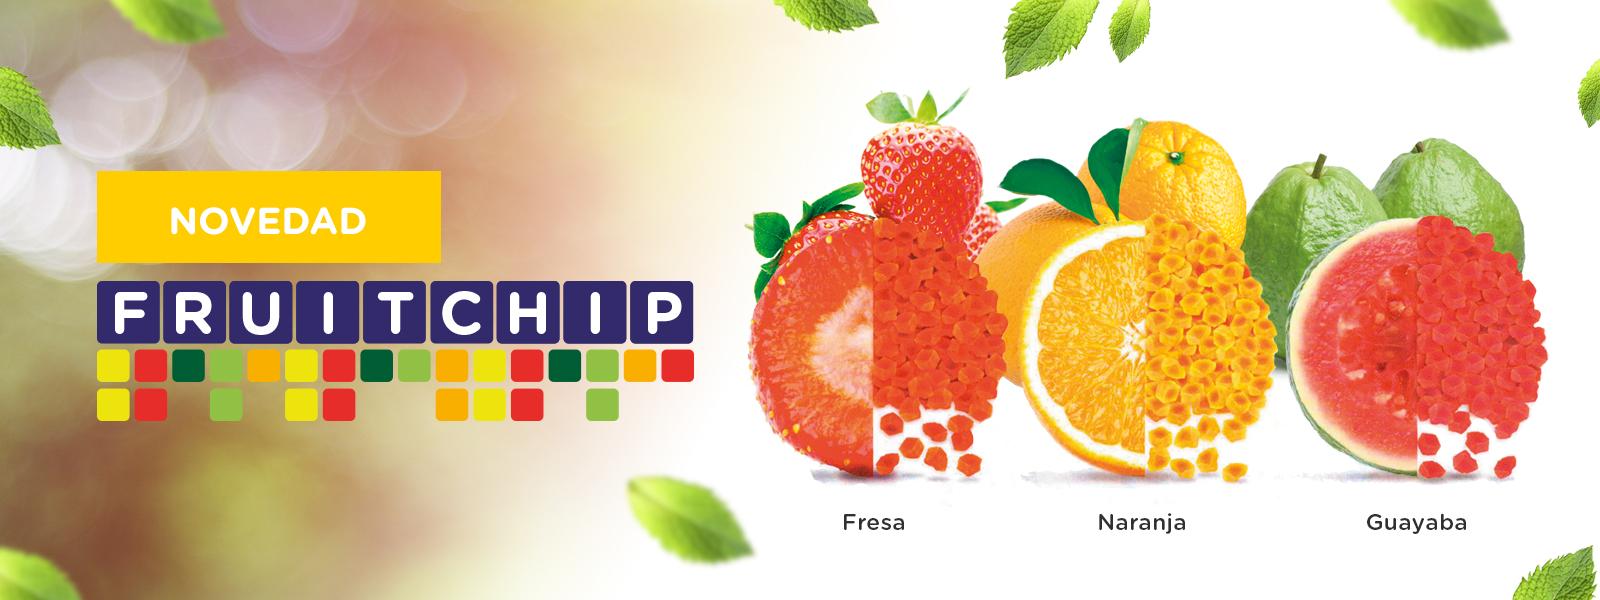 Carino Fruitchip